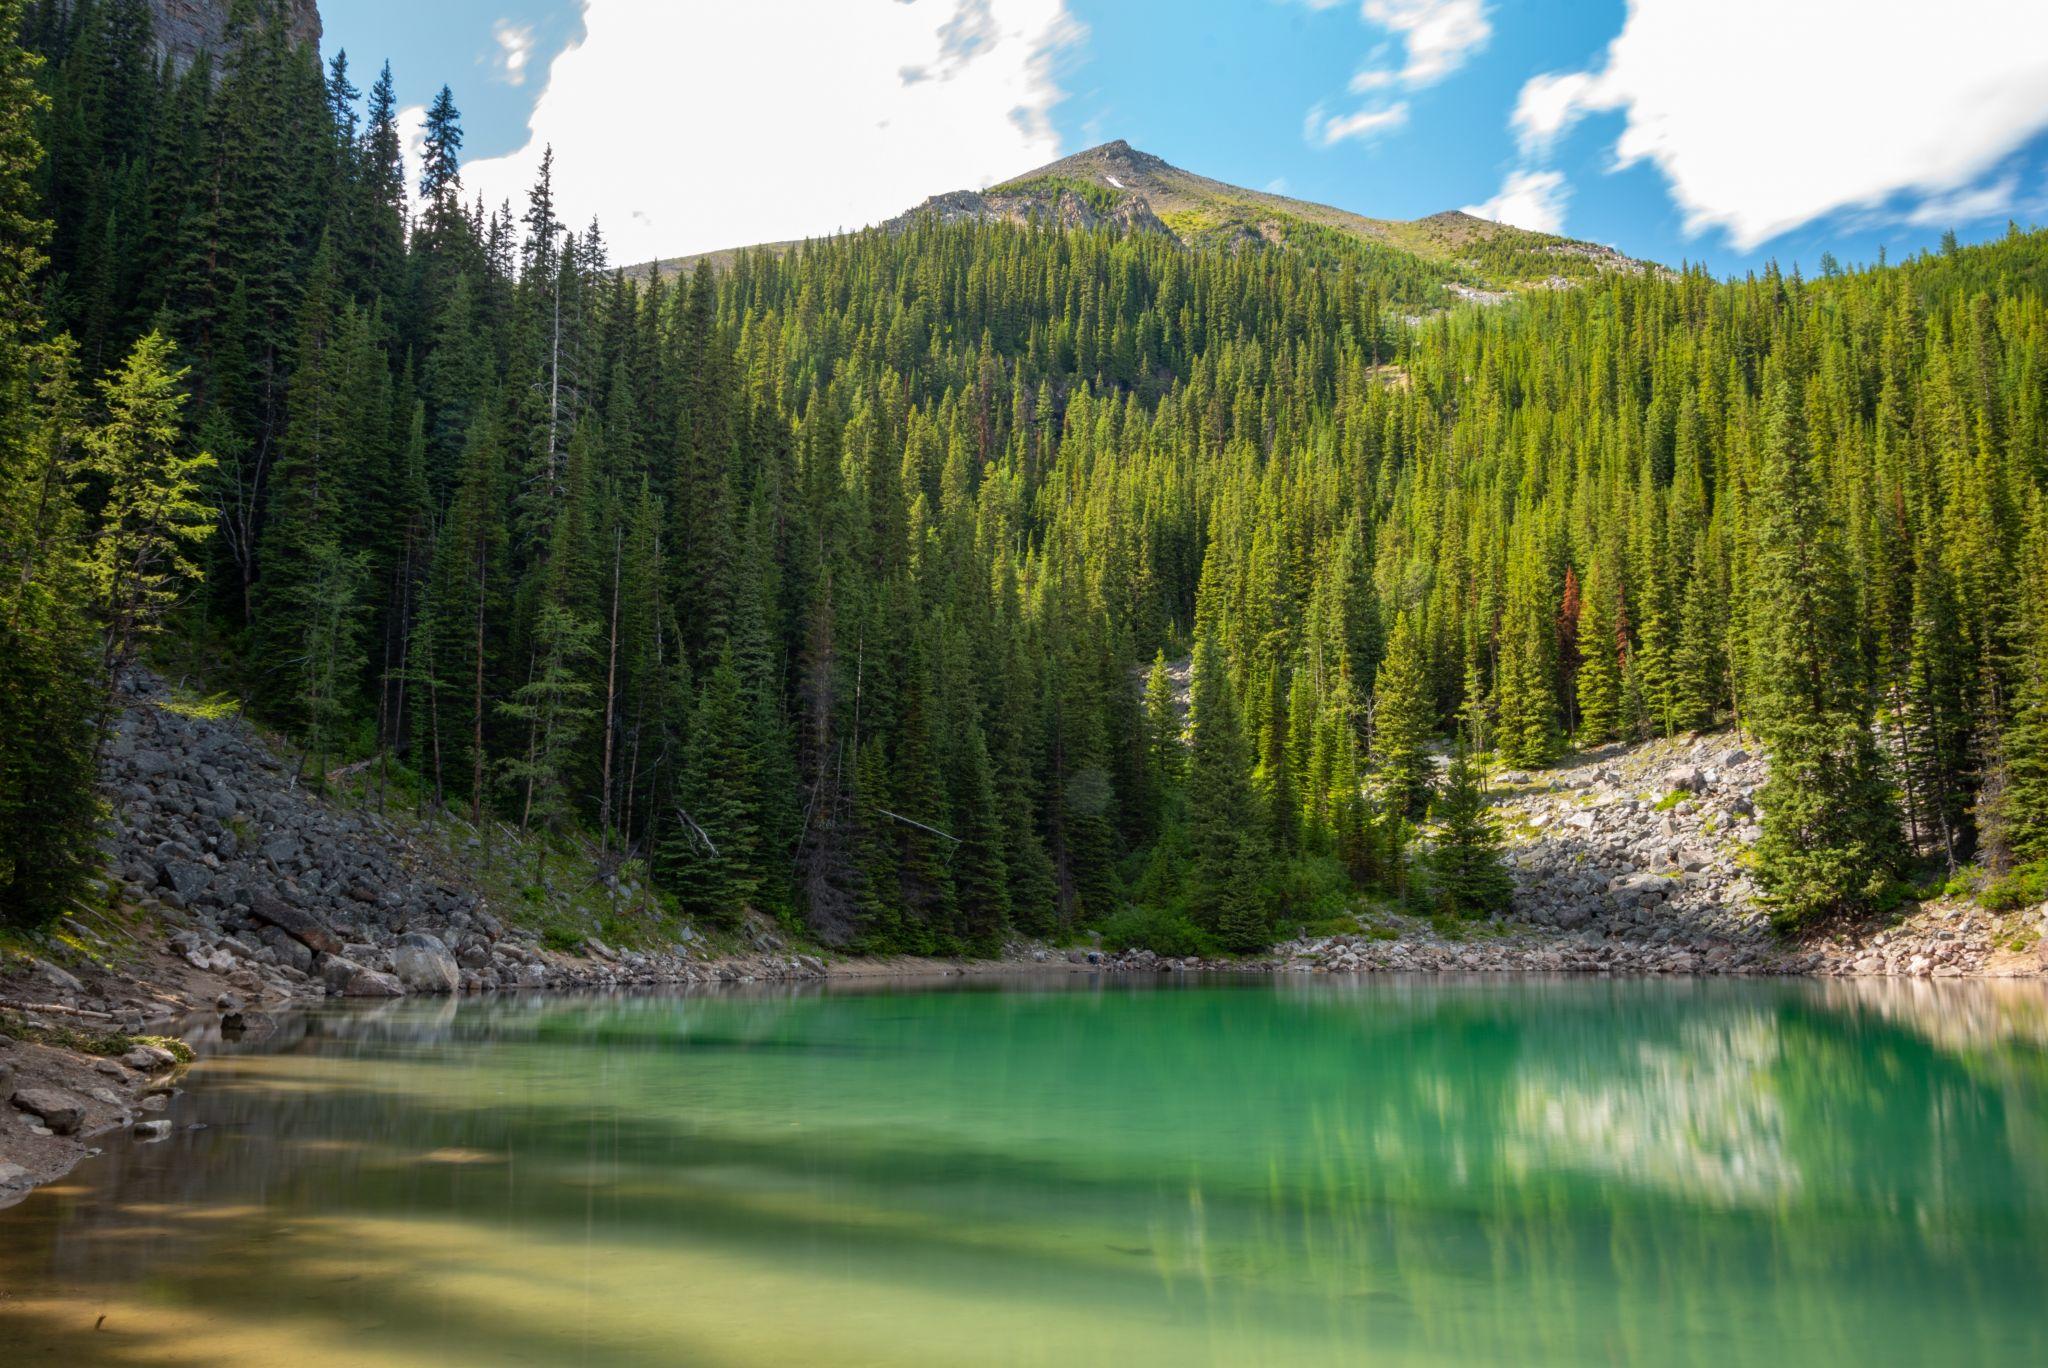 Mirror Lake, Canada